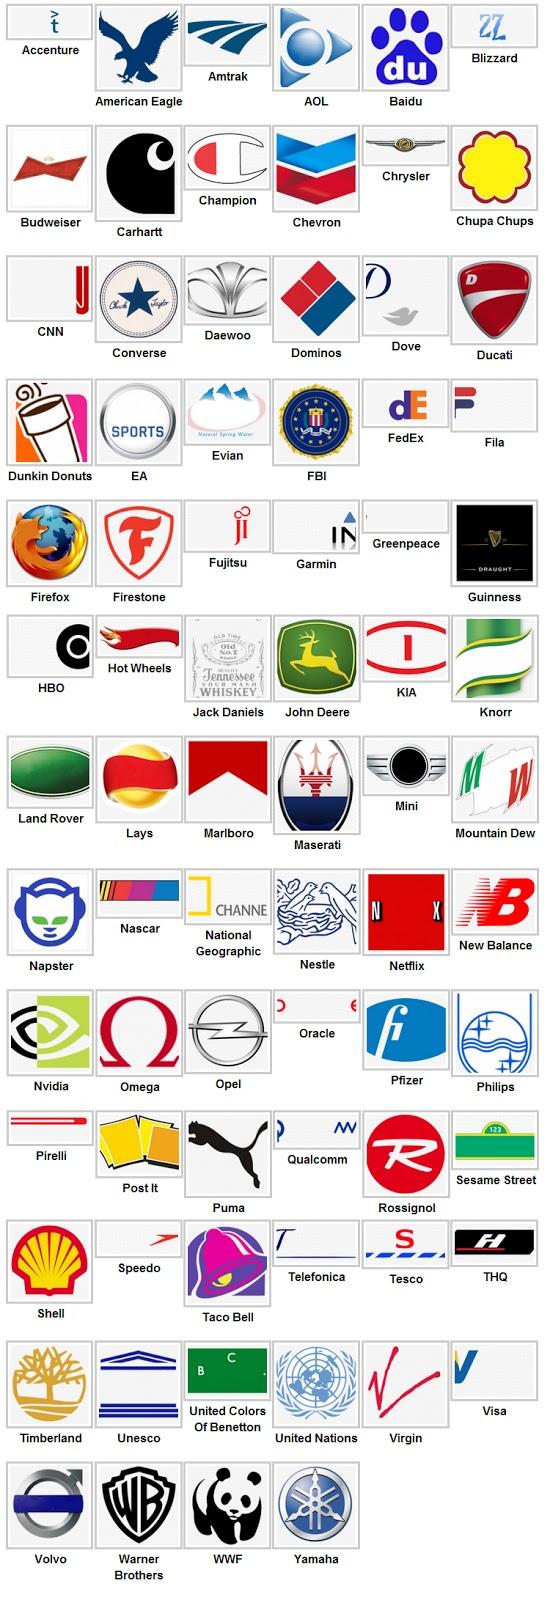 logos level 3 Logo Quiz Answers 2013